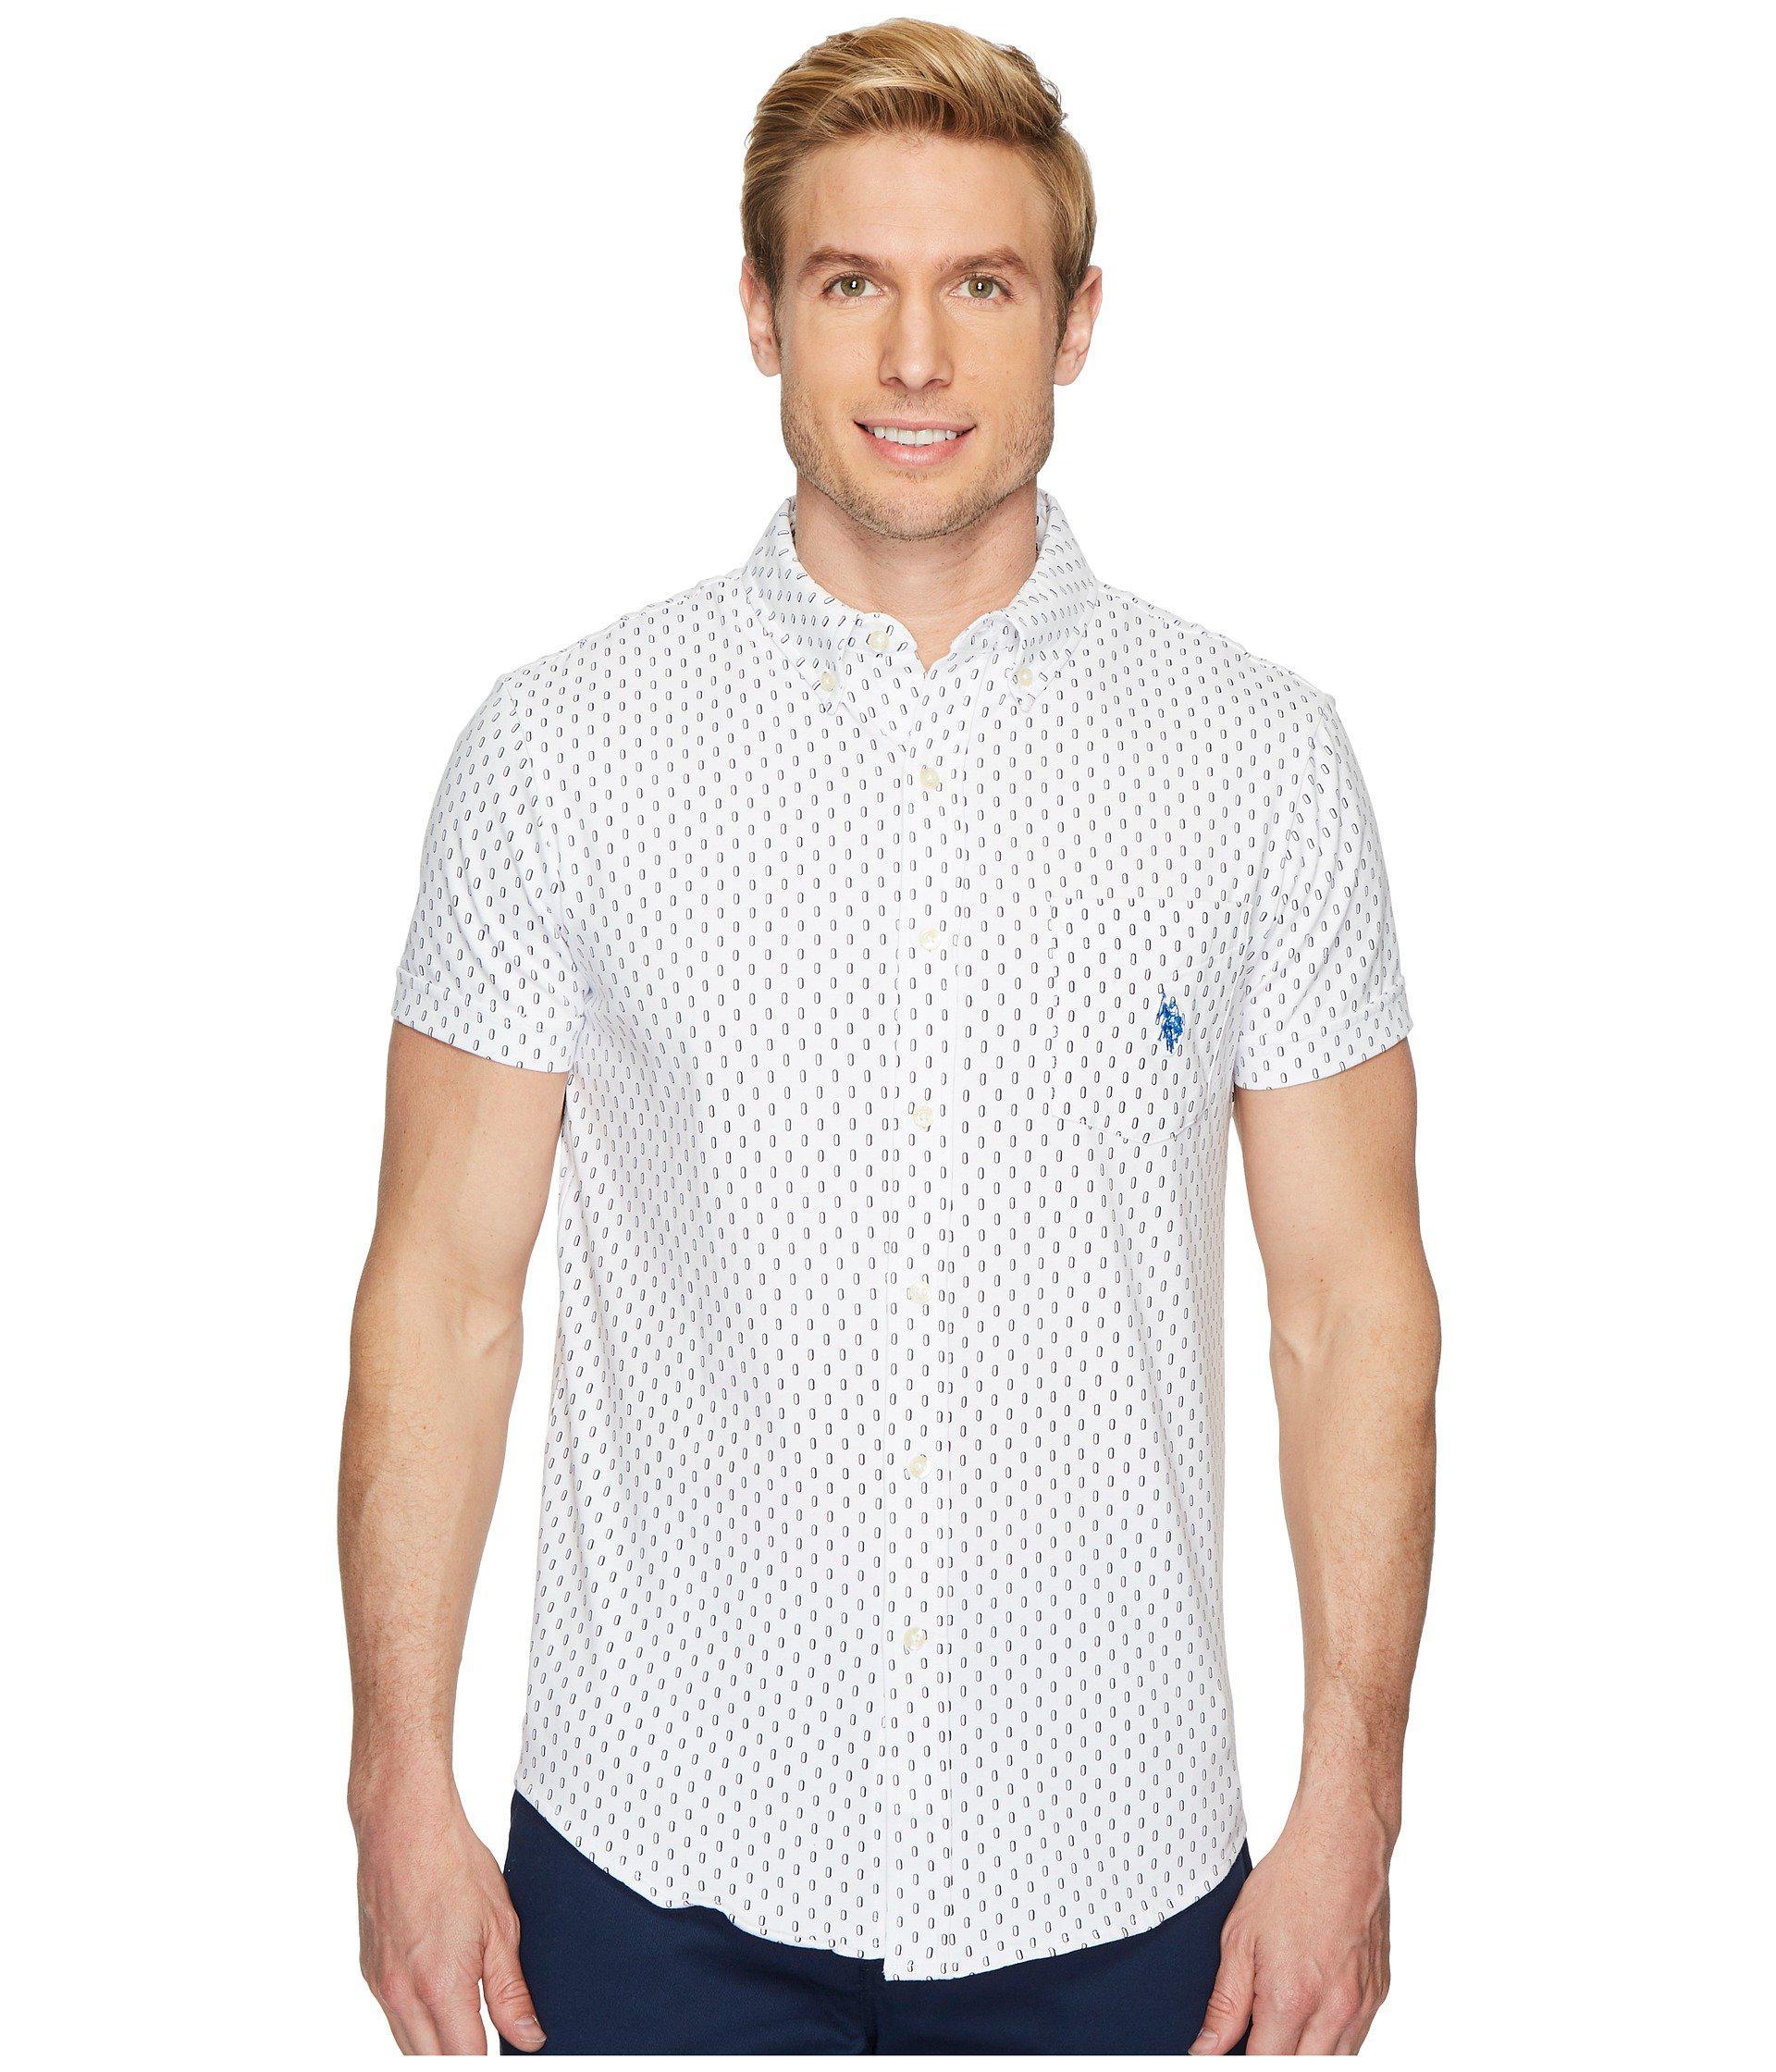 U.S. POLO ASSN. Men's White Short Sleeve Slim Fit Fancy Shirt